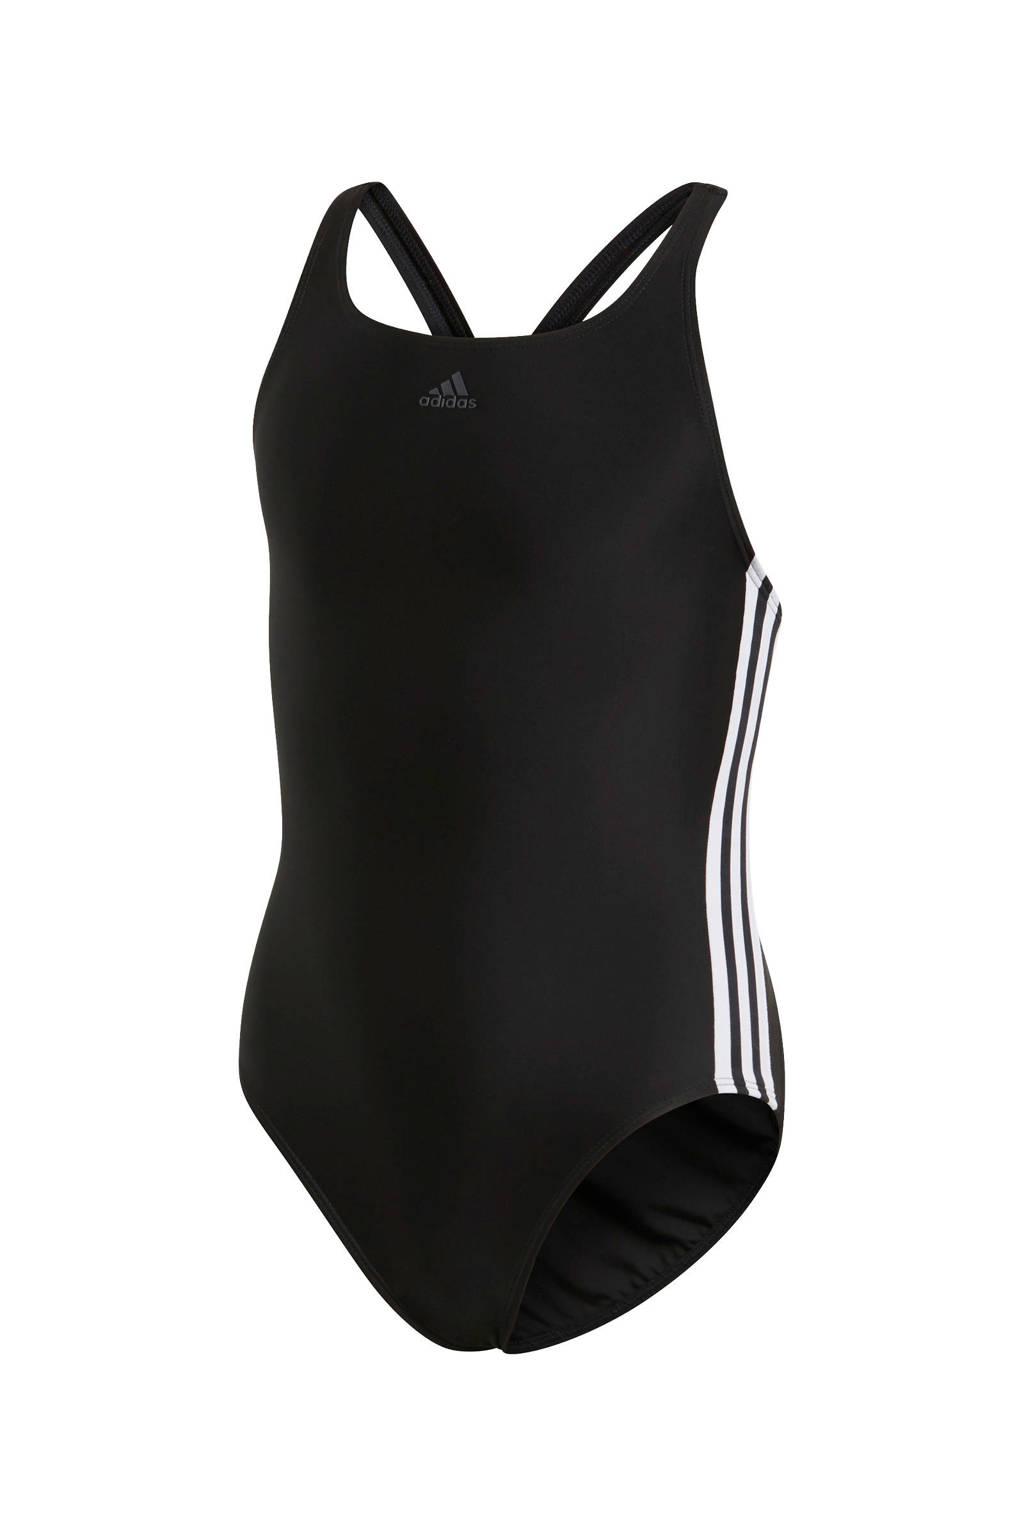 adidas infinitex 3-stripes zwart, Zwart/wit